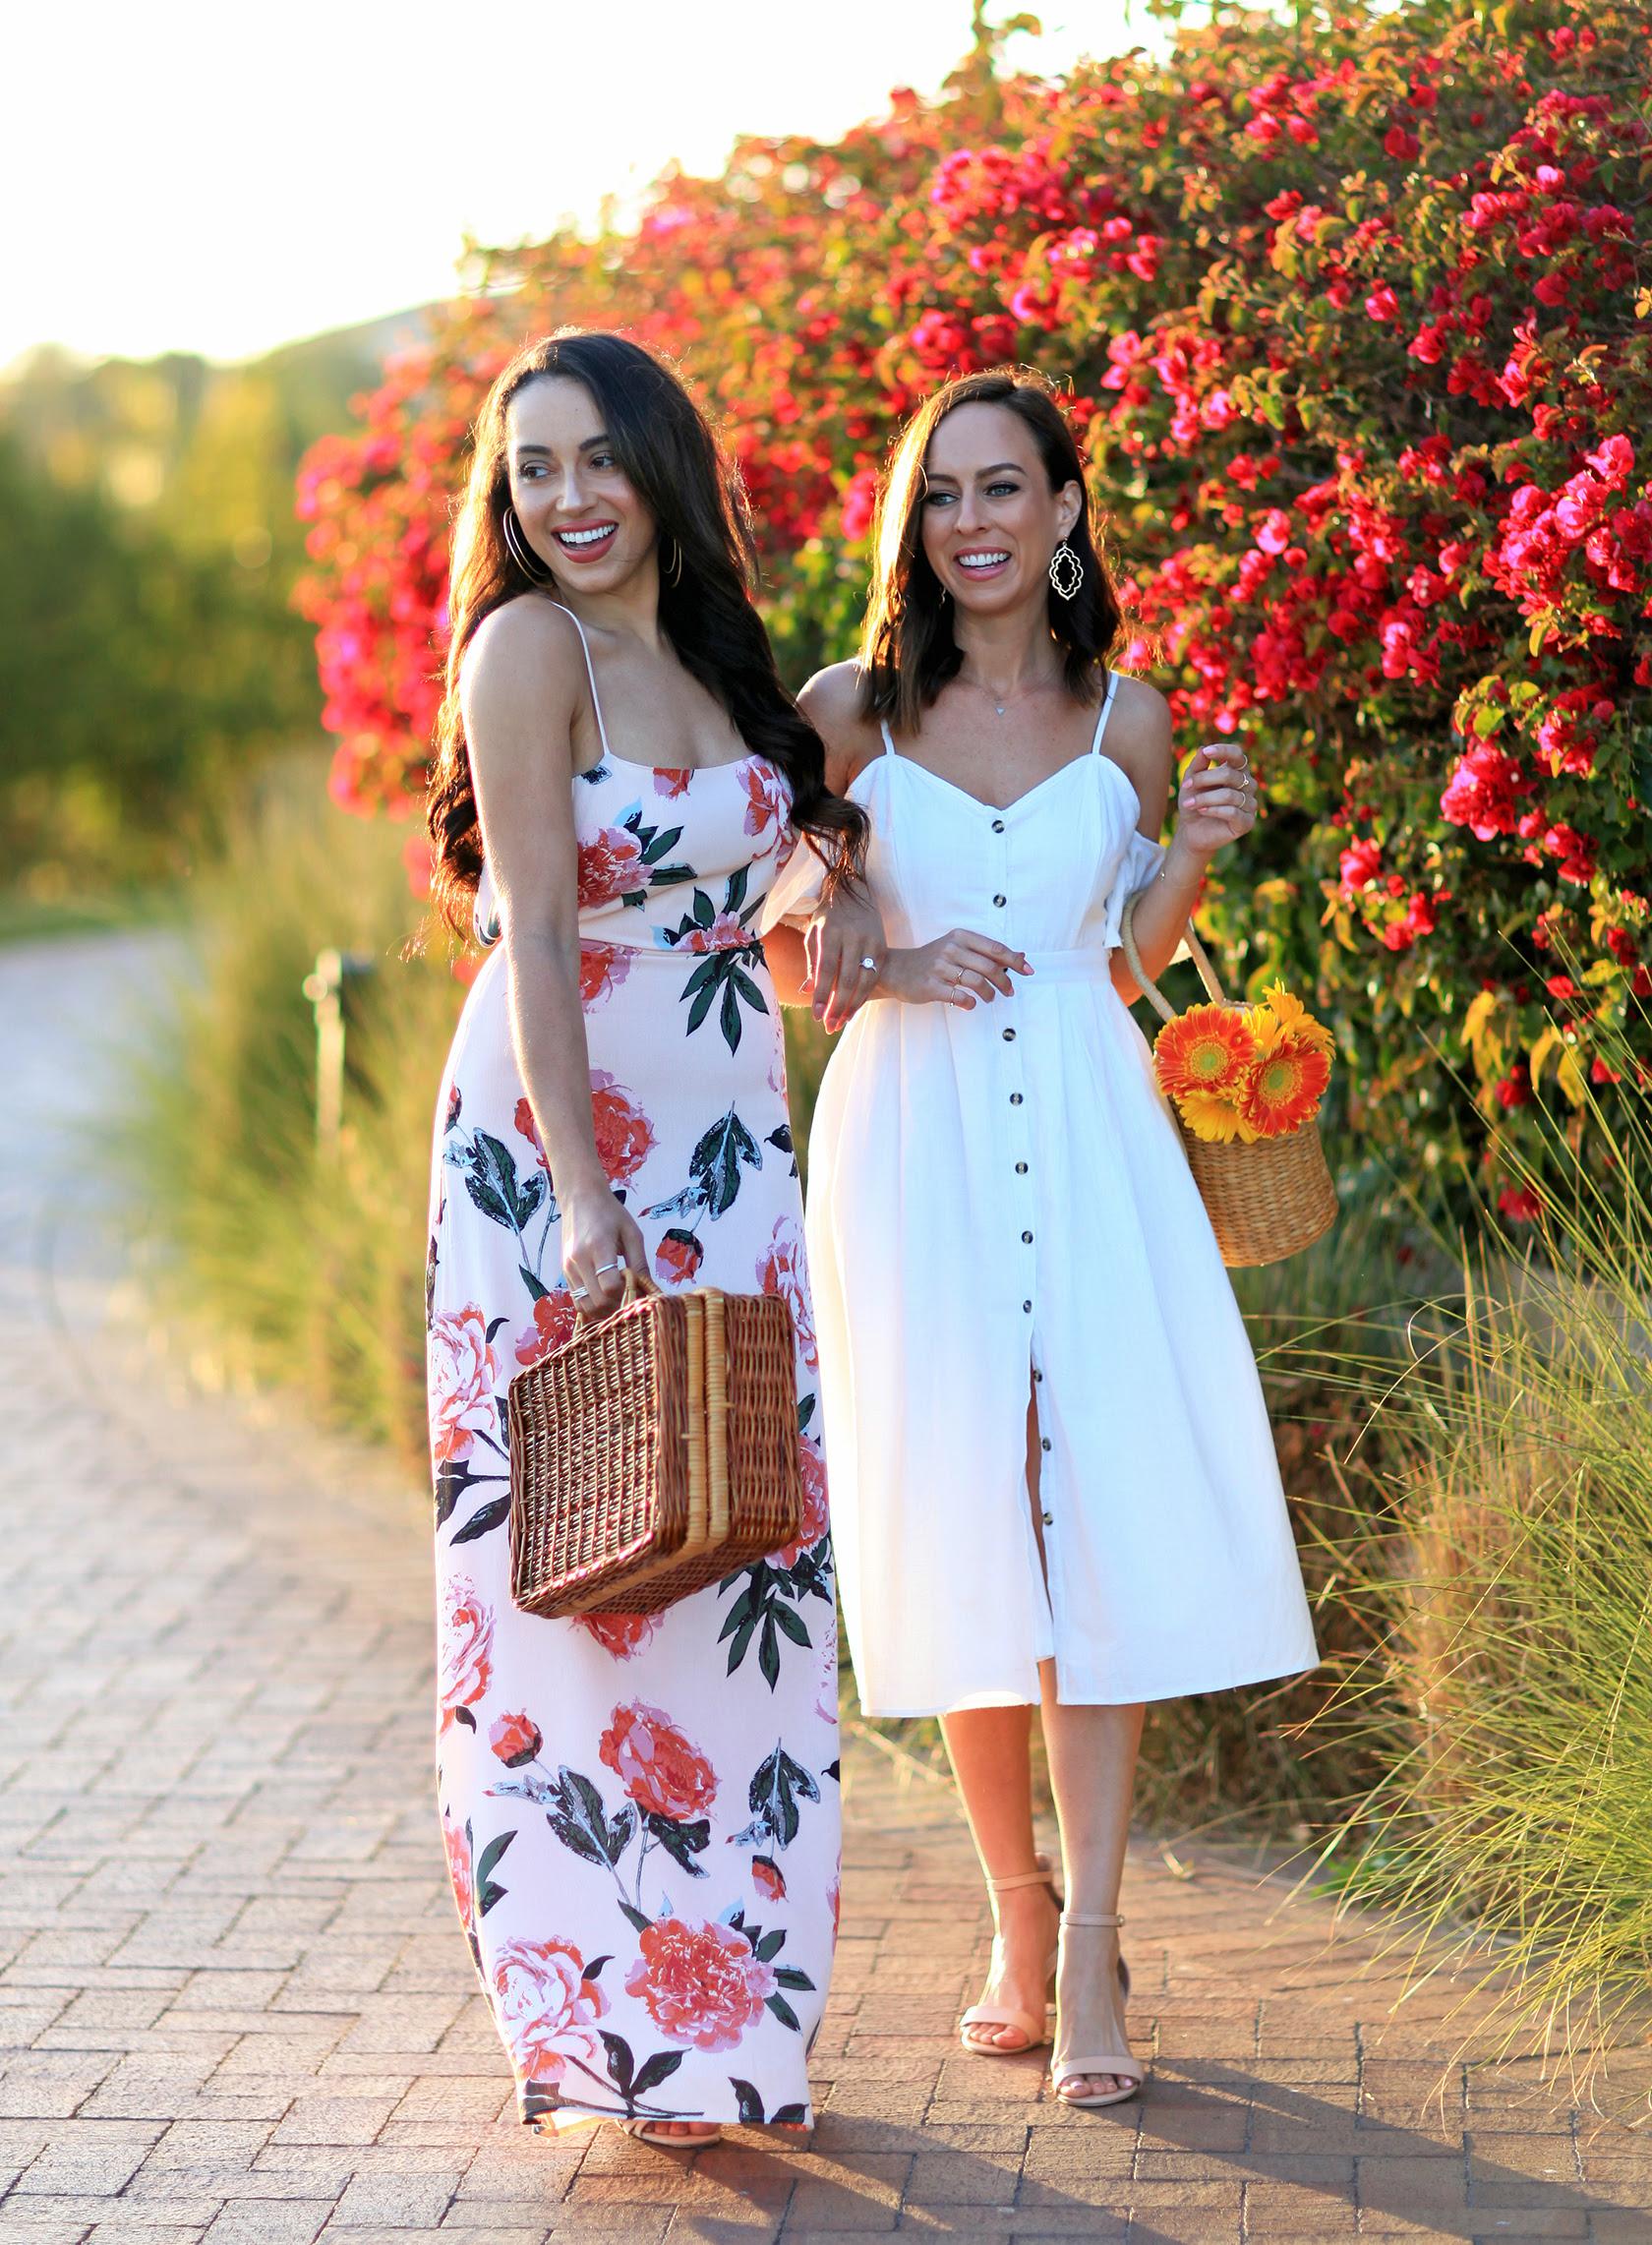 Summer Vacation Dresses | 2018 Fashion & Travel